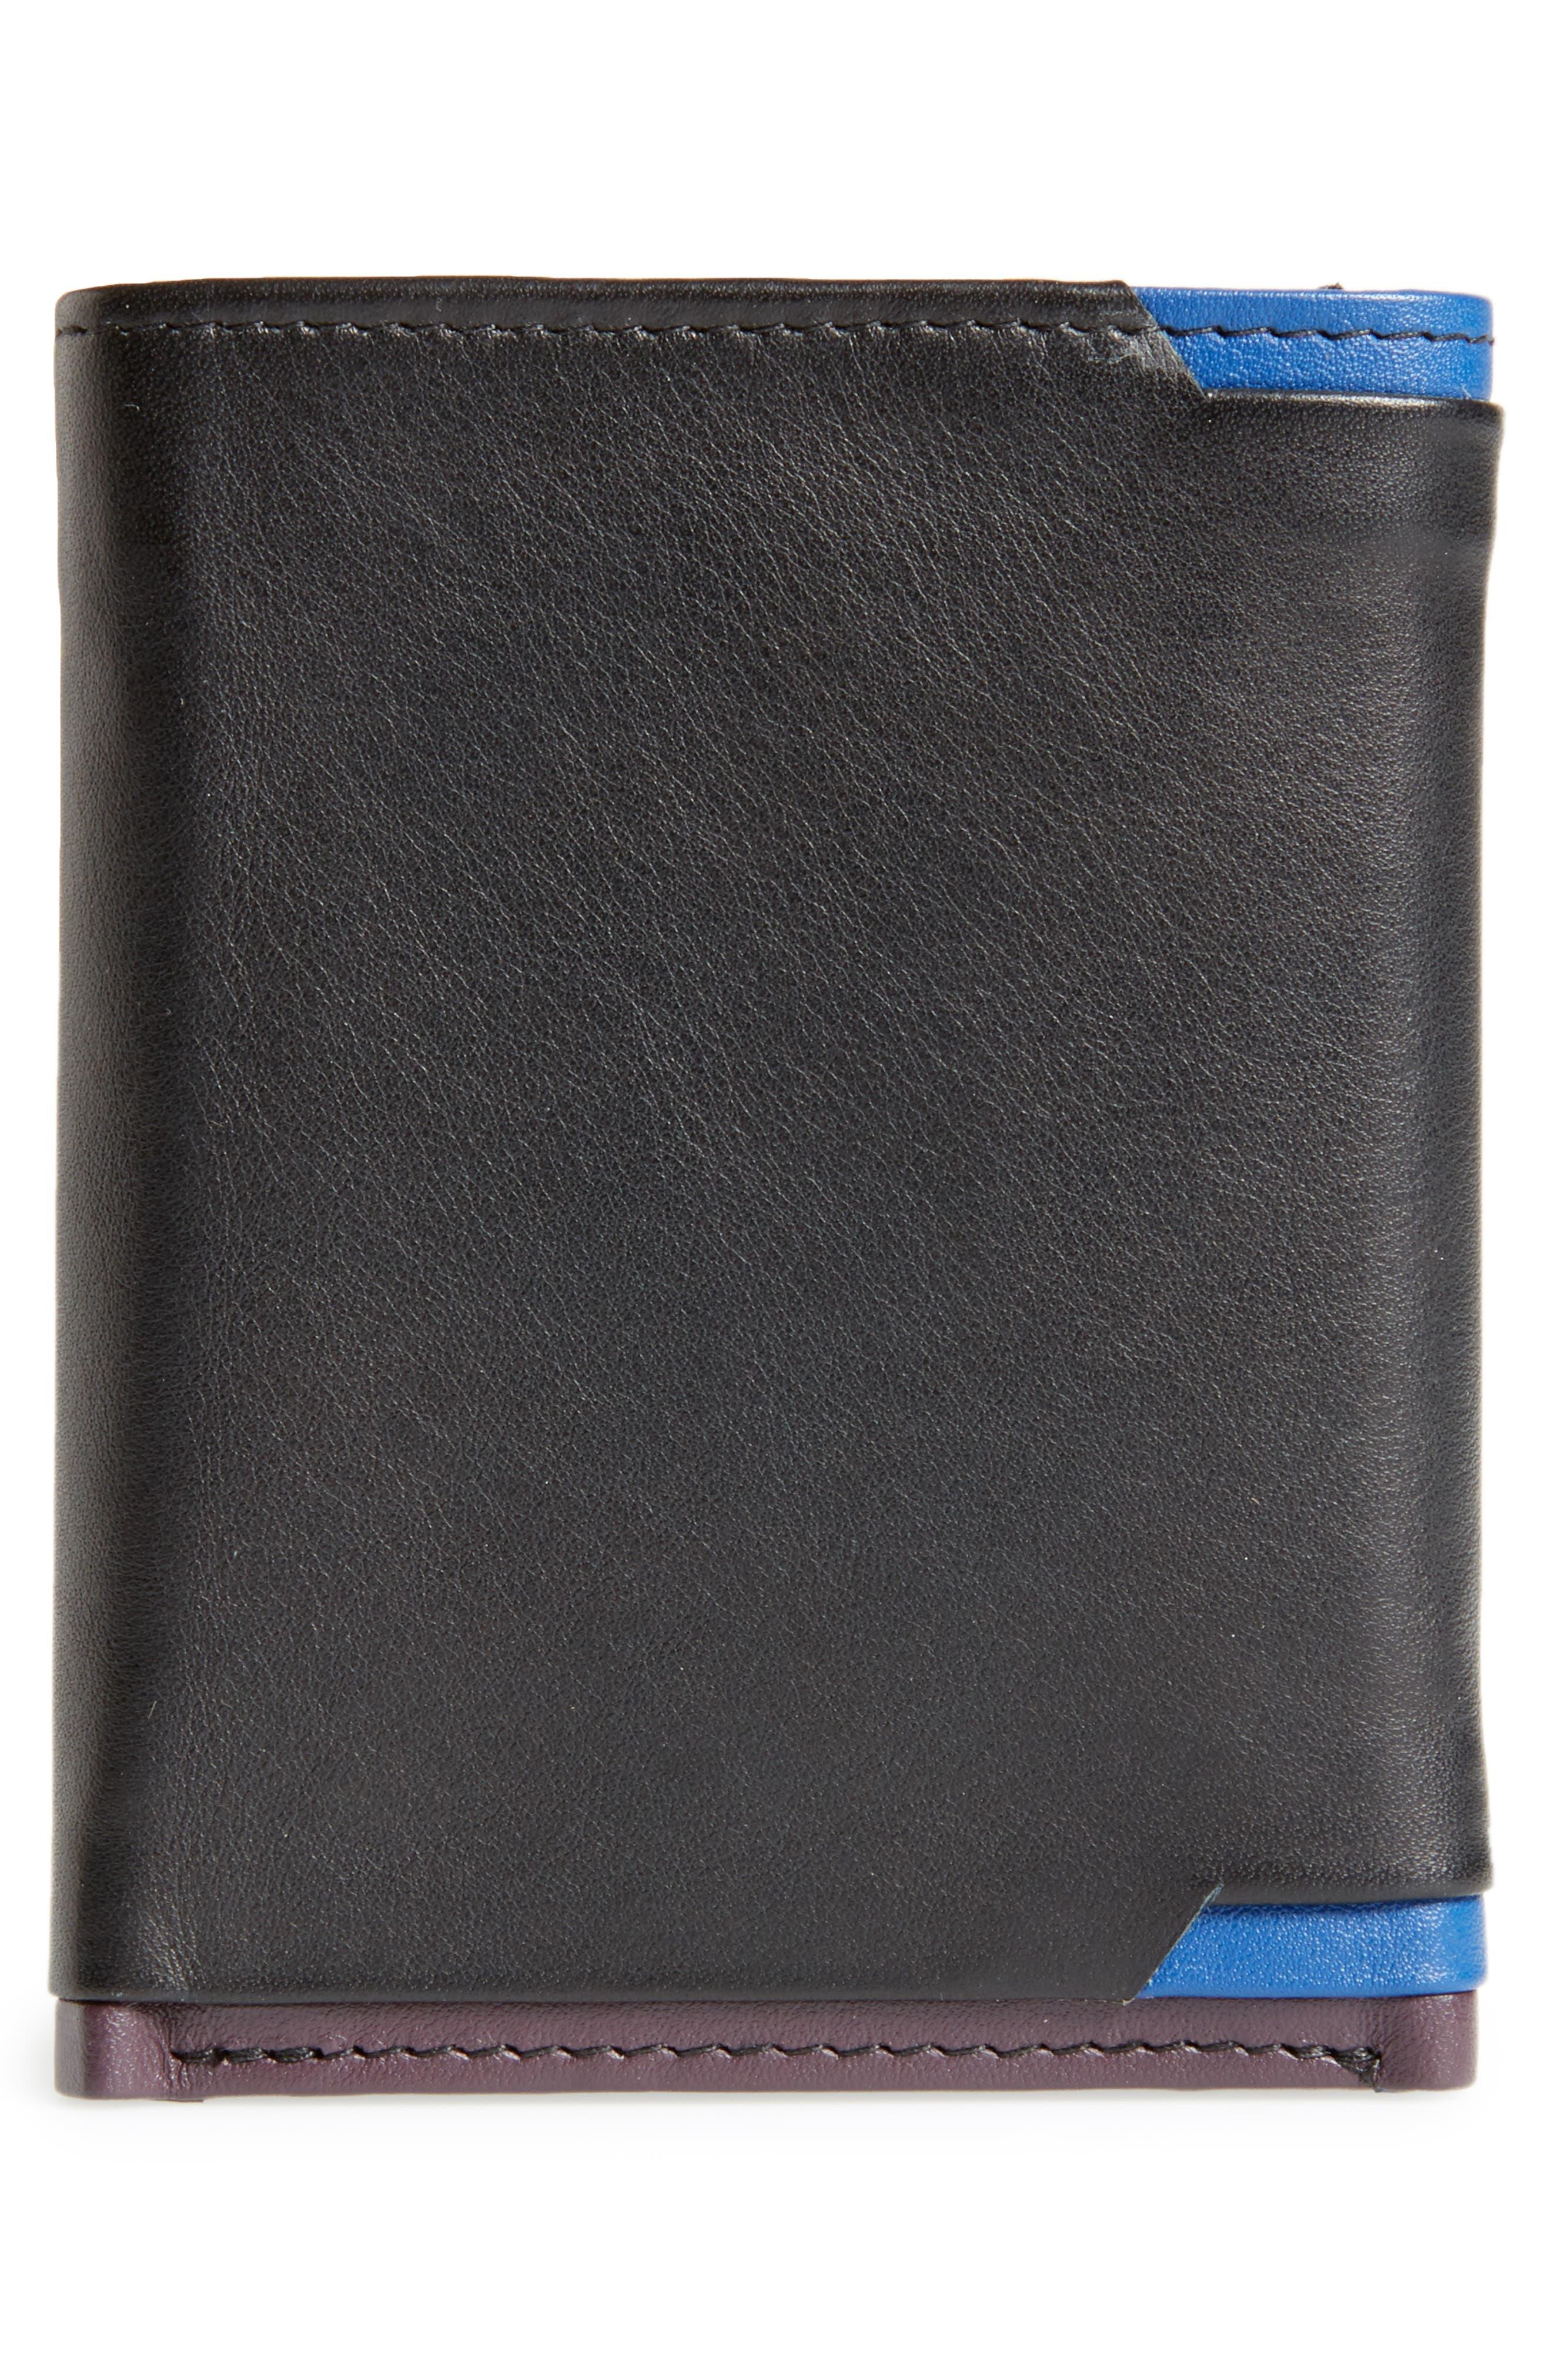 Vien Corner Detail Trifold Leather Wallet,                             Alternate thumbnail 3, color,                             001